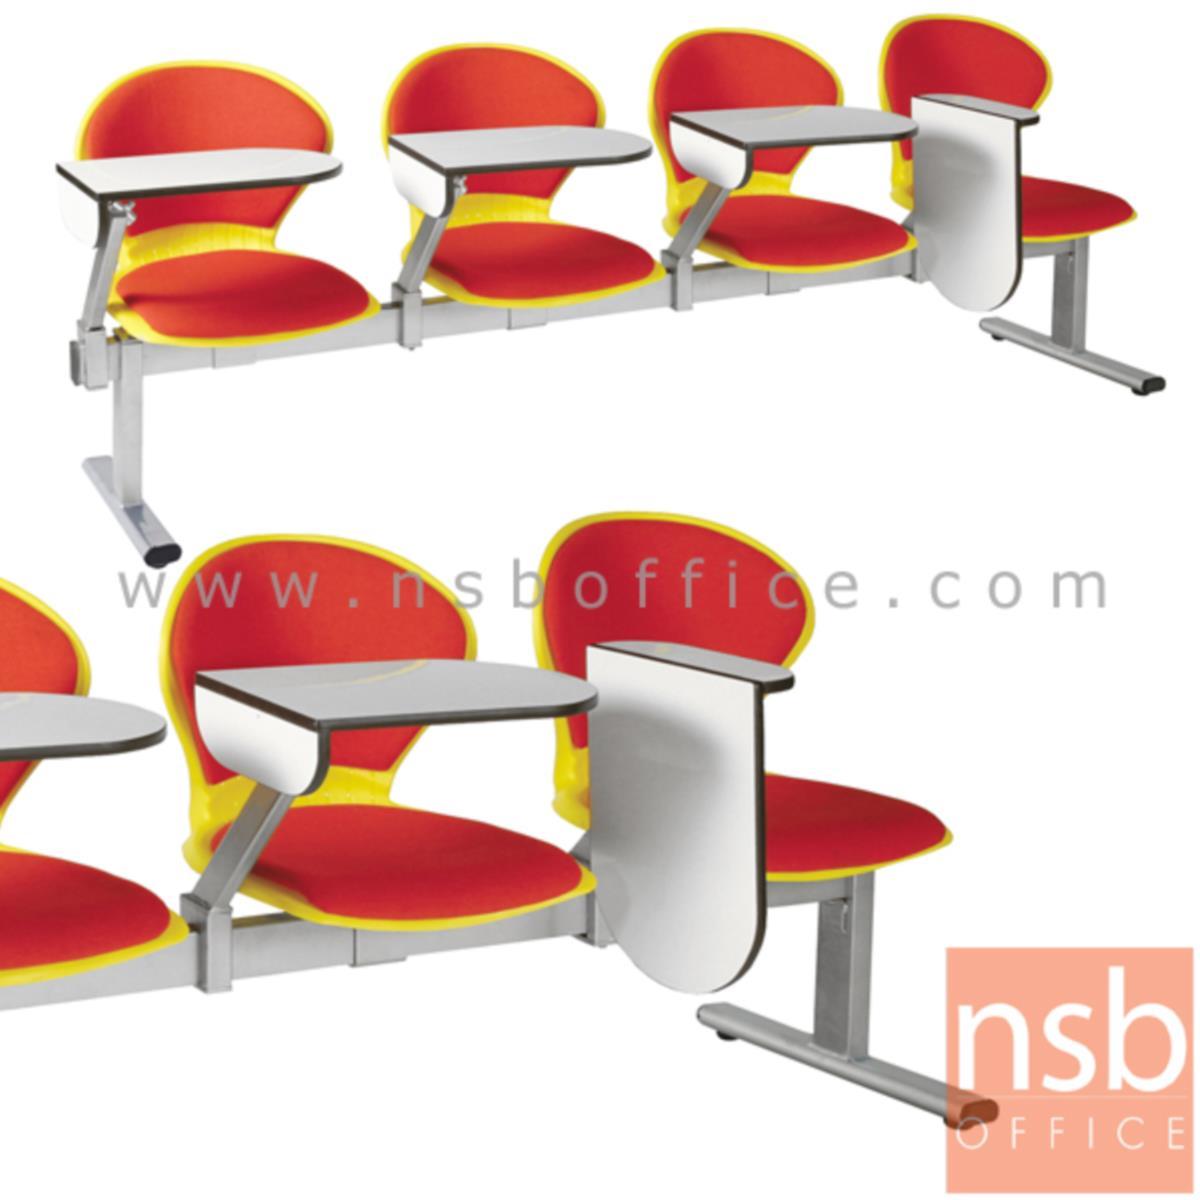 B17A026:เก้าอี้เลคเชอร์แถวเฟรมโพลี่หุ้มเบาะ รุ่น D576 2 ,3 และ 4 ที่นั่ง ขาเหล็กพ่นสีเทา